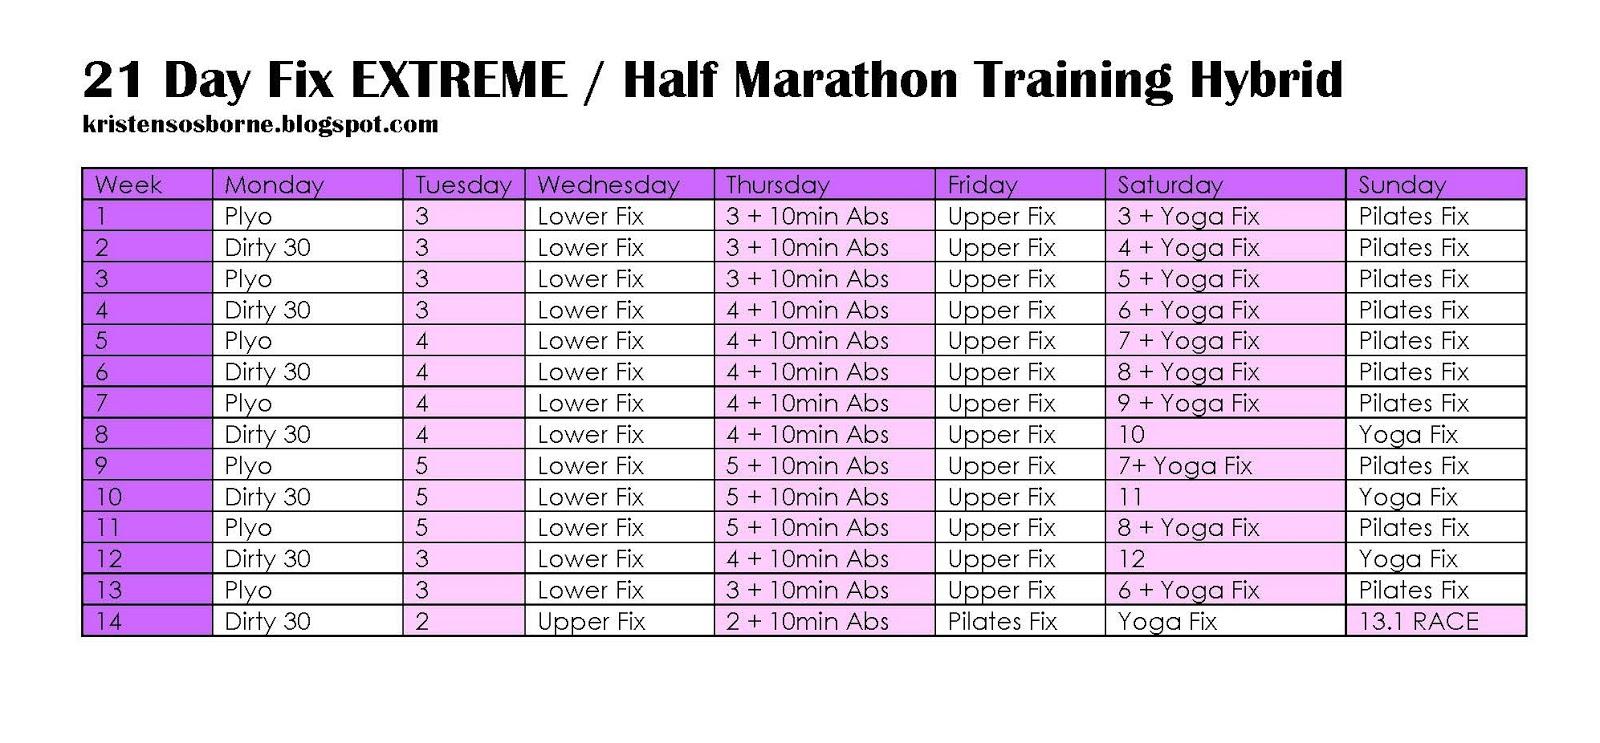 Calendario De 21 Day Fix Extreme.Yoga Fix Schedule Examples And Forms